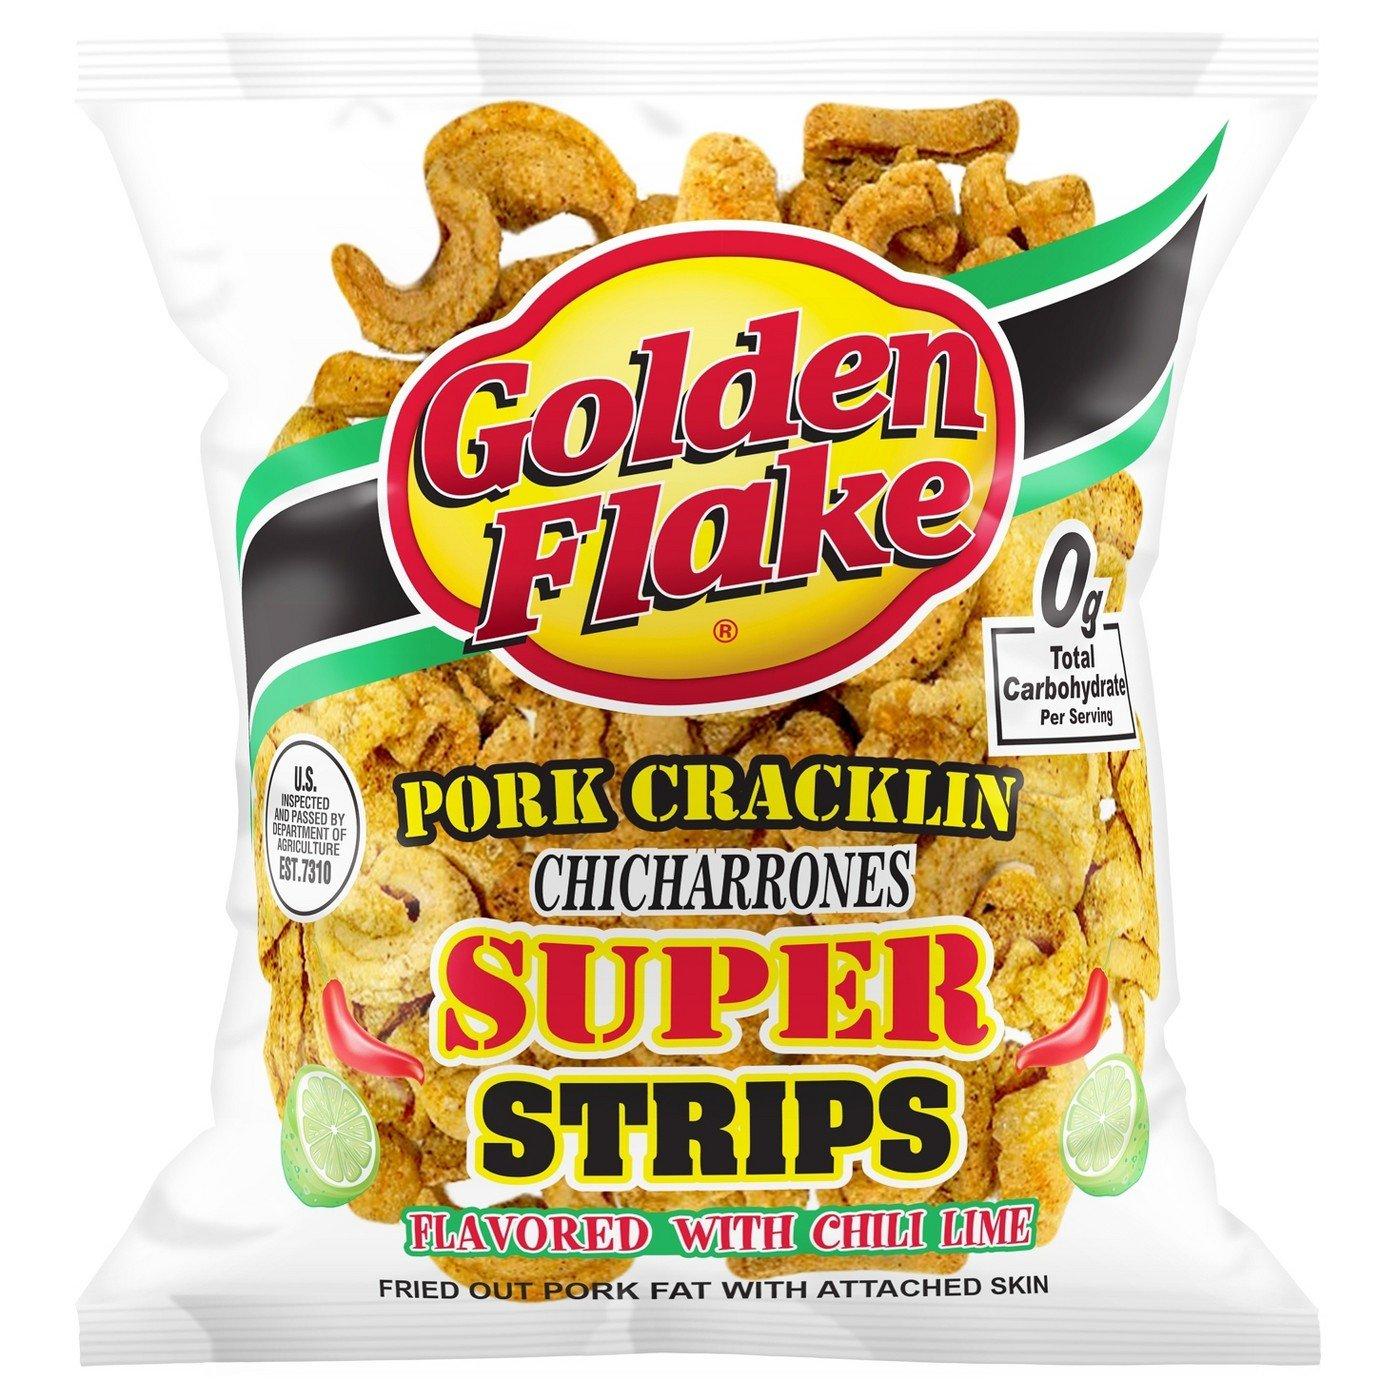 Golden Flake Pork Cracklin Chicharrones Super Strips 3.25oz, pack of 1